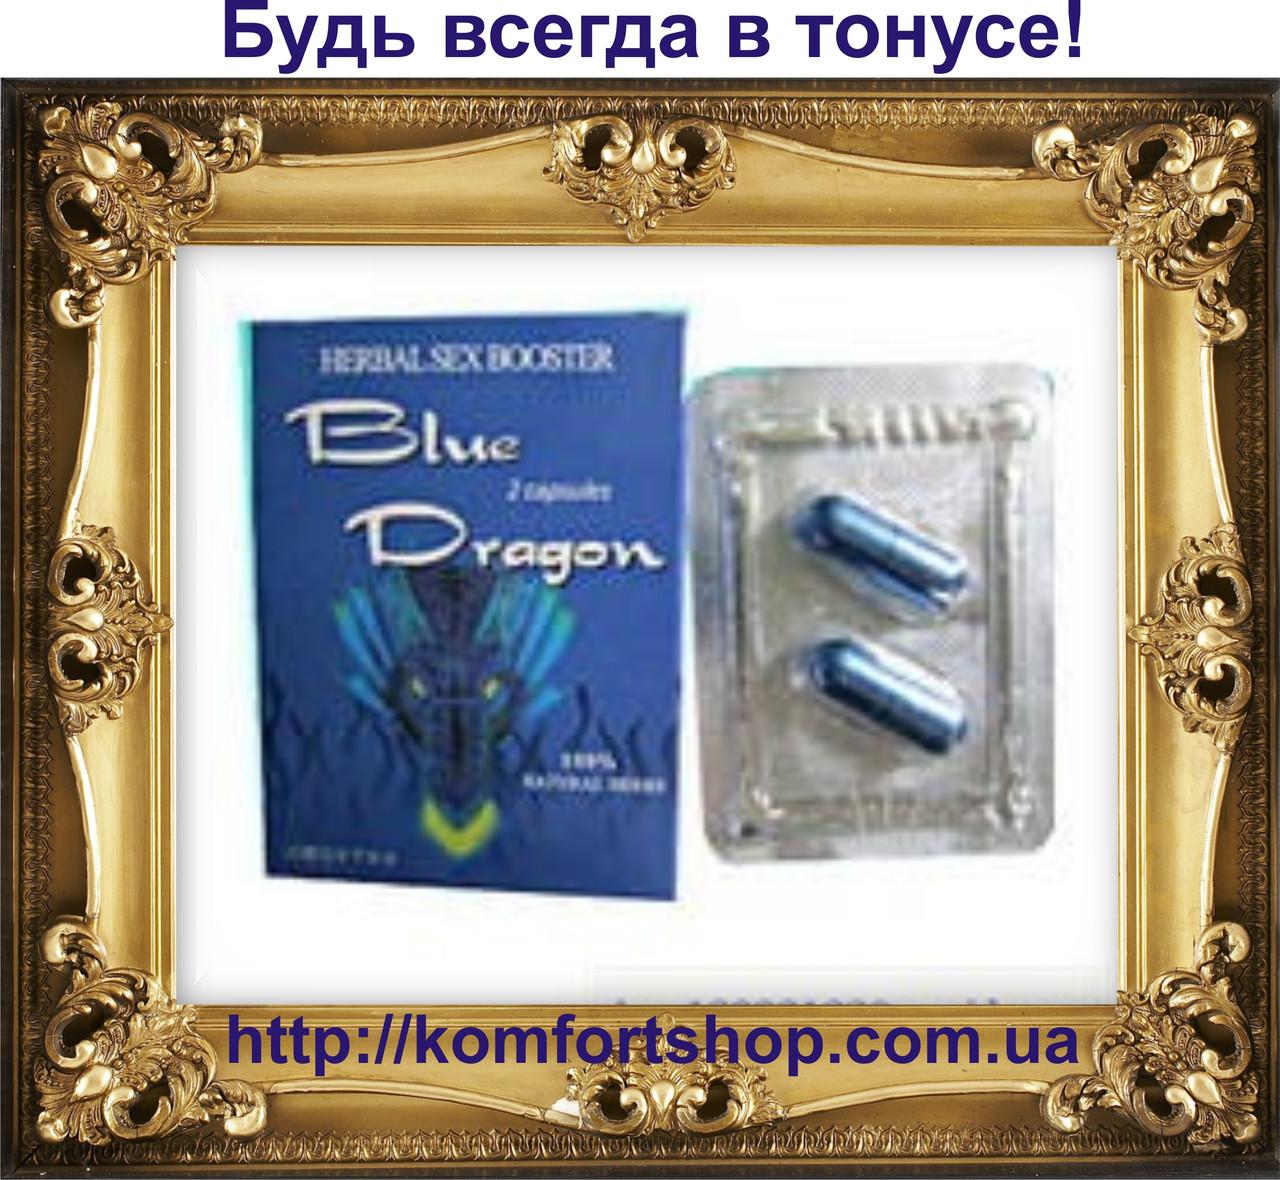 Sexe blue dragon nsfw pic